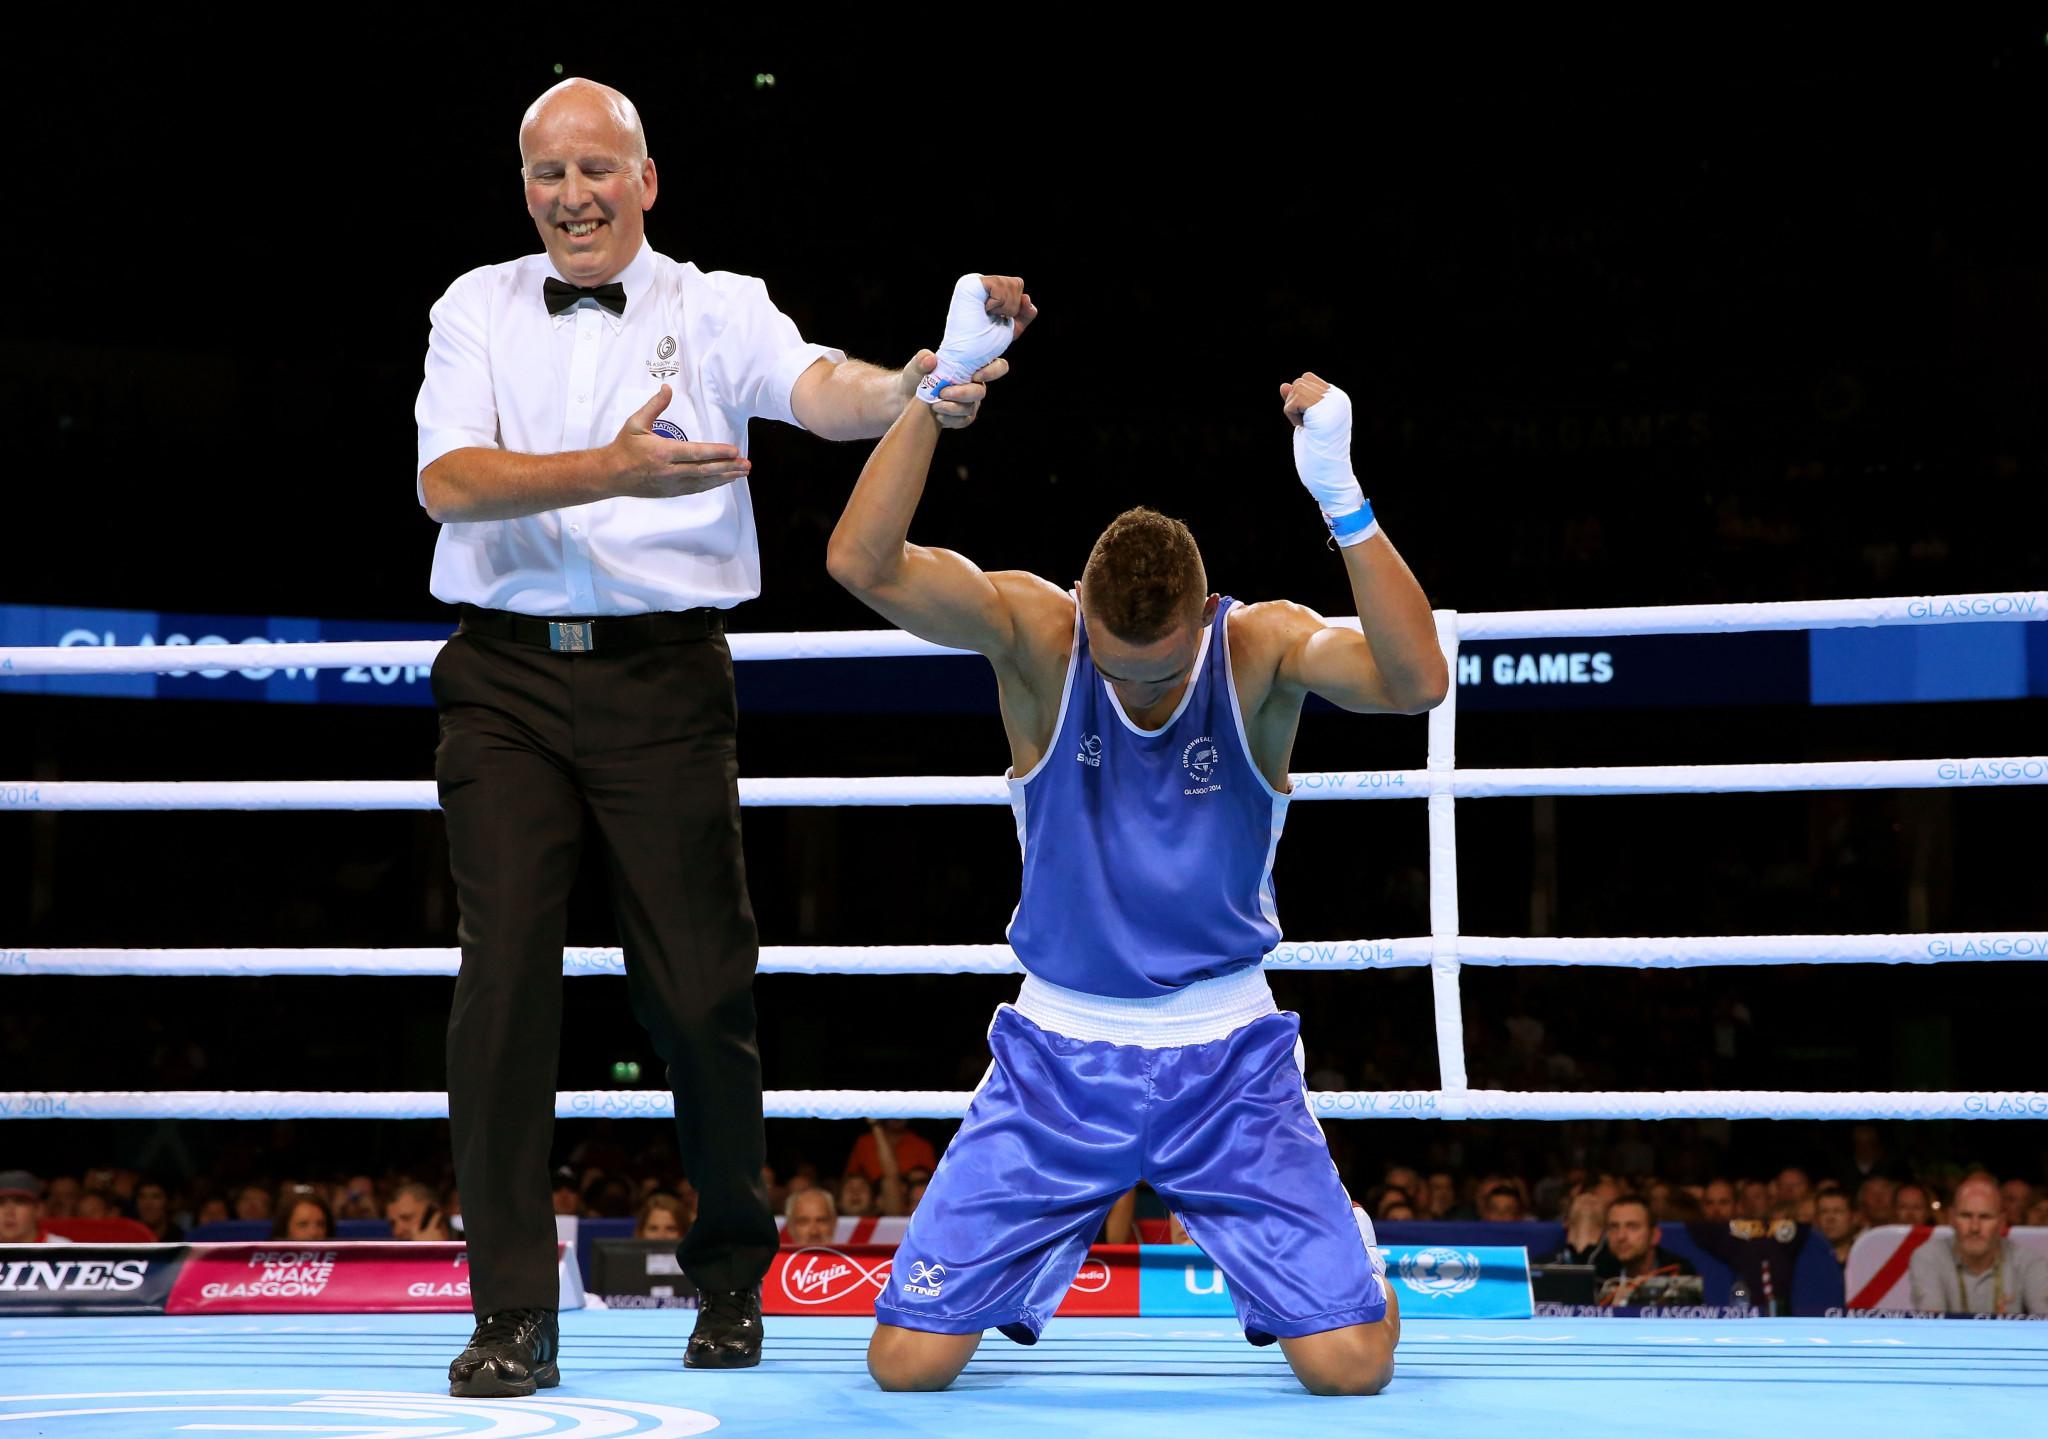 David Nyika has won gold at two consecutive Commonwealth Games ©Getty Images